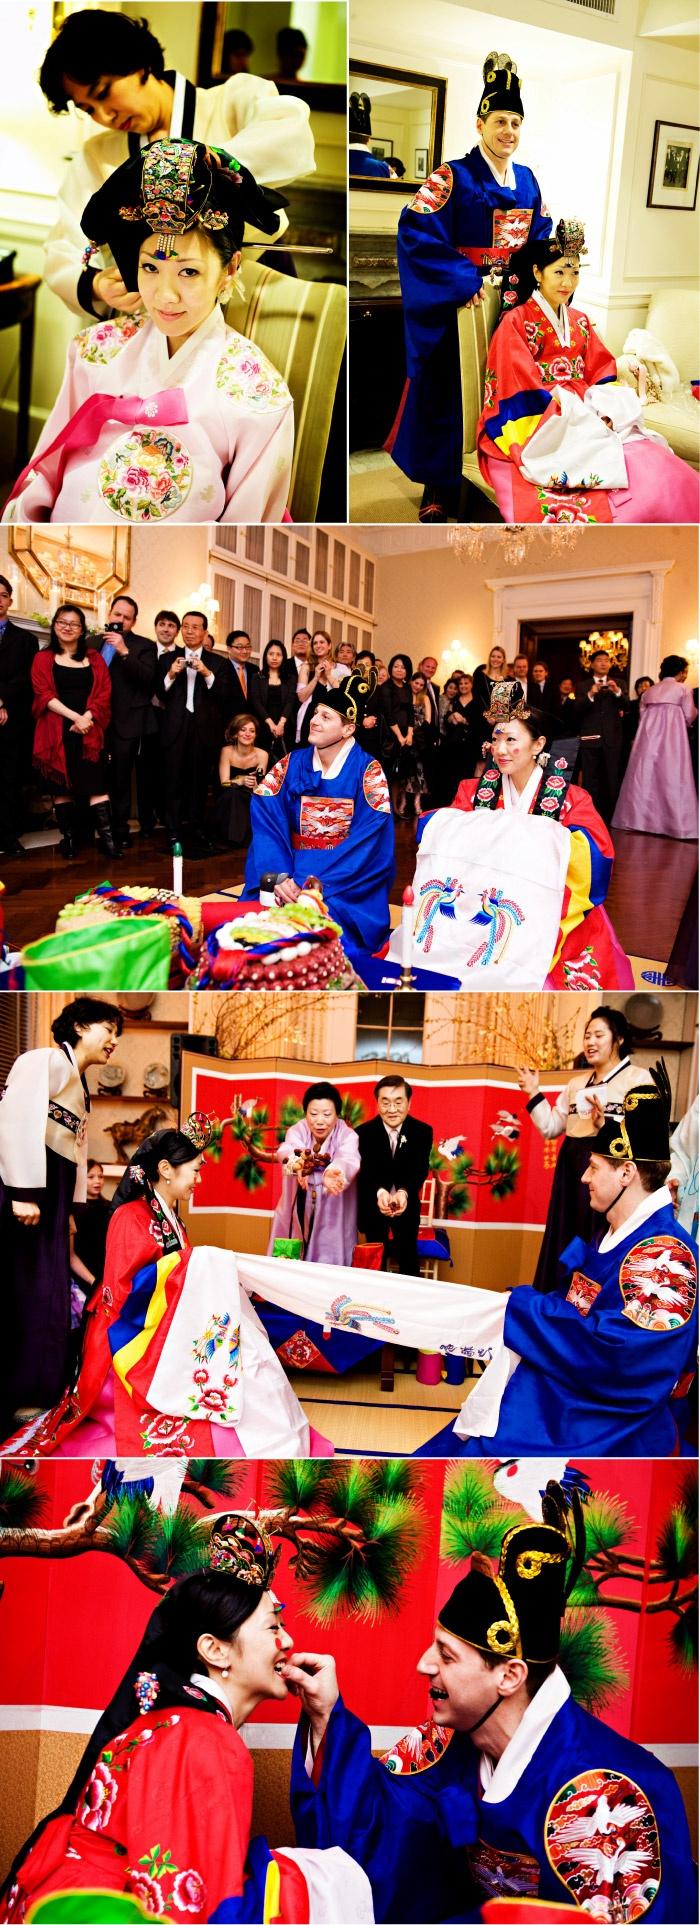 For more wedding INFO contact www.piperstudios.com (905) 265-1555Korean wedding. So beautiful #혼례식 #전통혼례 #신부 #Toronto #Piperstudios #notmine #photography #videography #Korean #Koreanwedding #traditional #Formal #Wedding #bridal #hanbok #bride #royal #royalwedding #inspiration #beautiful